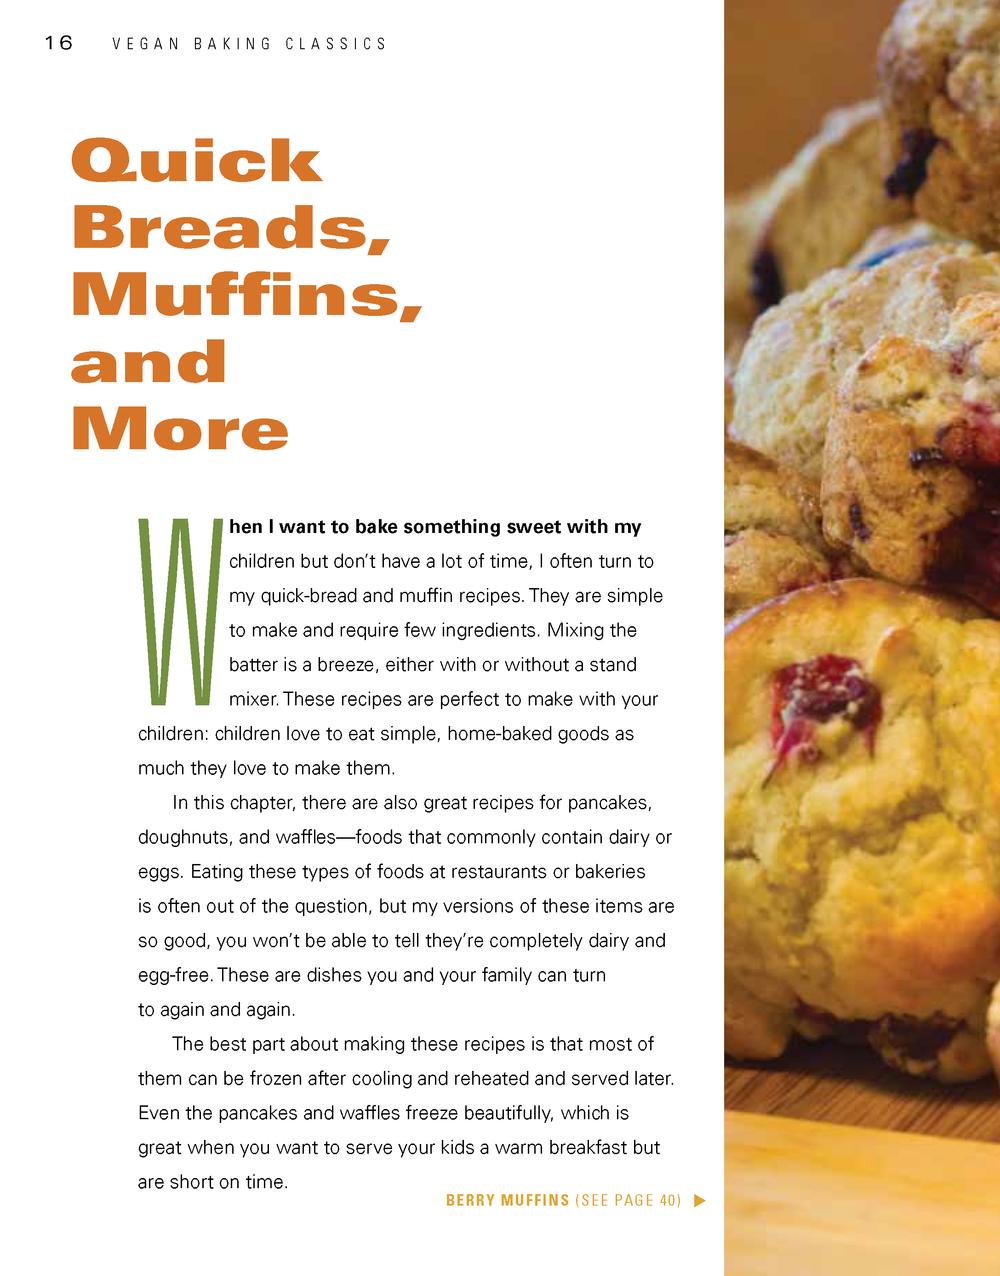 Vegan Baking Classics_Page_04.png